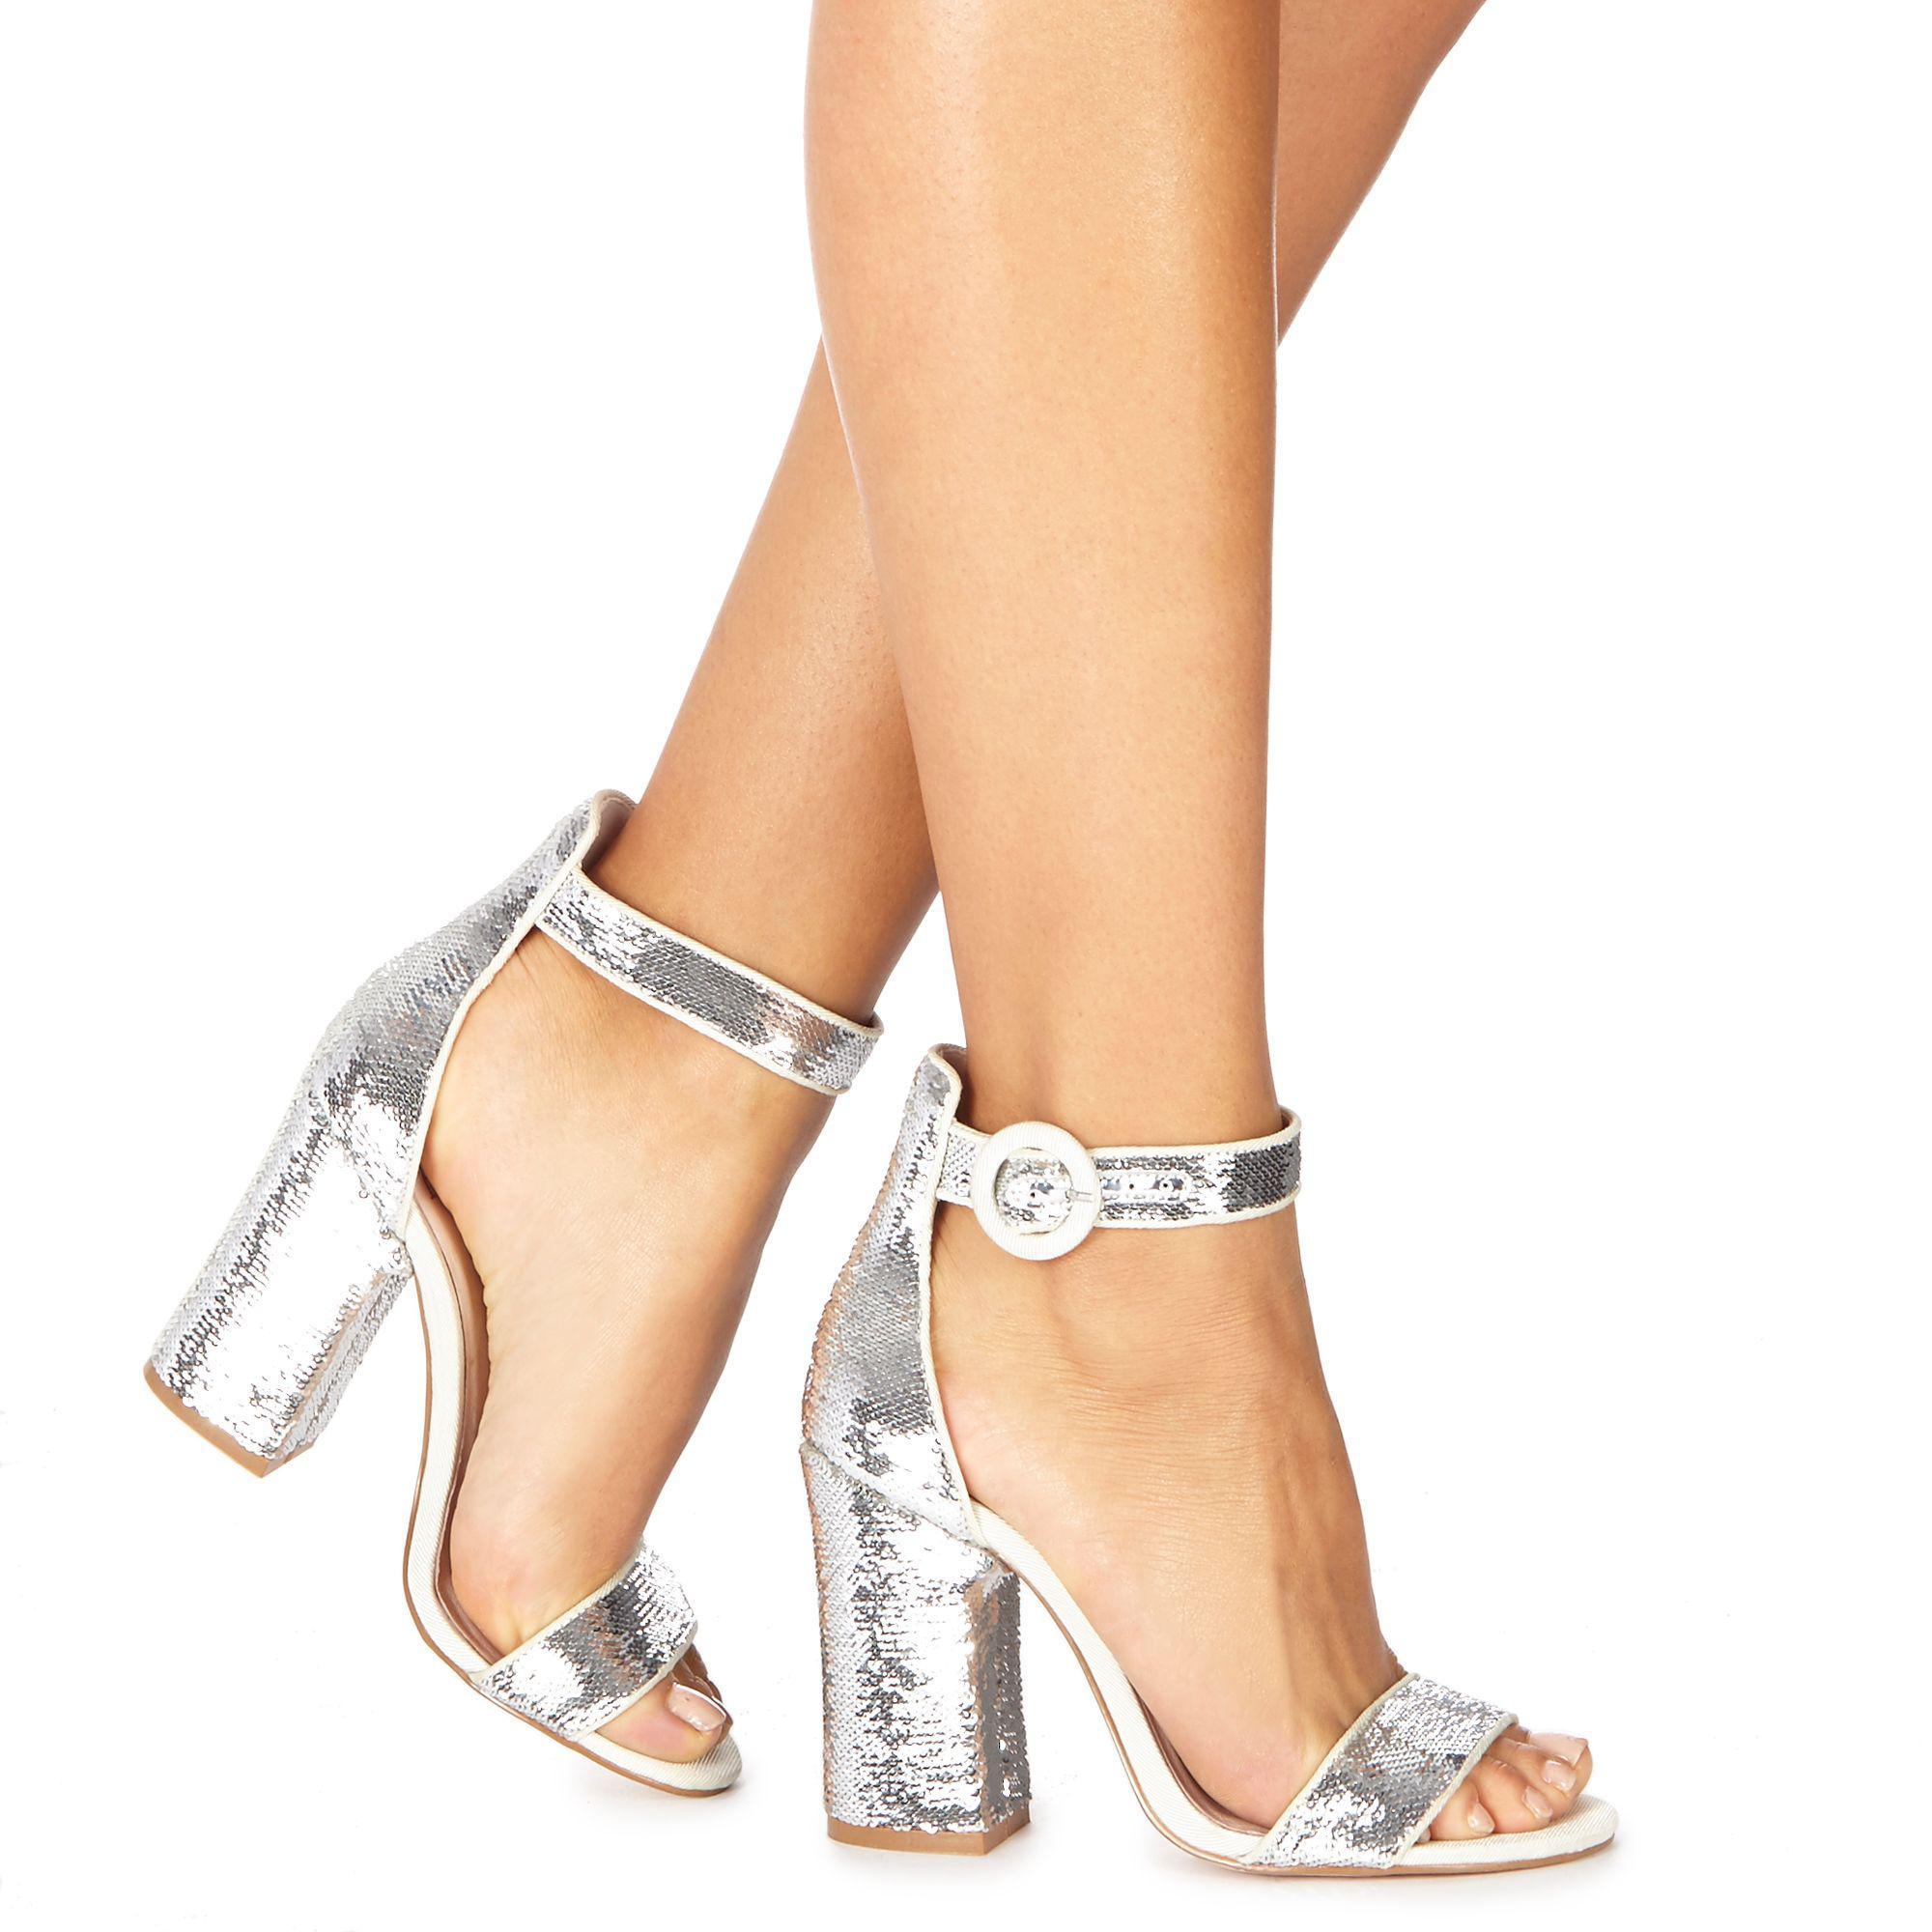 ca6a755c2cd0 Faith Silver  danielle  High Block Heel Ankle Strap Sandals in ...